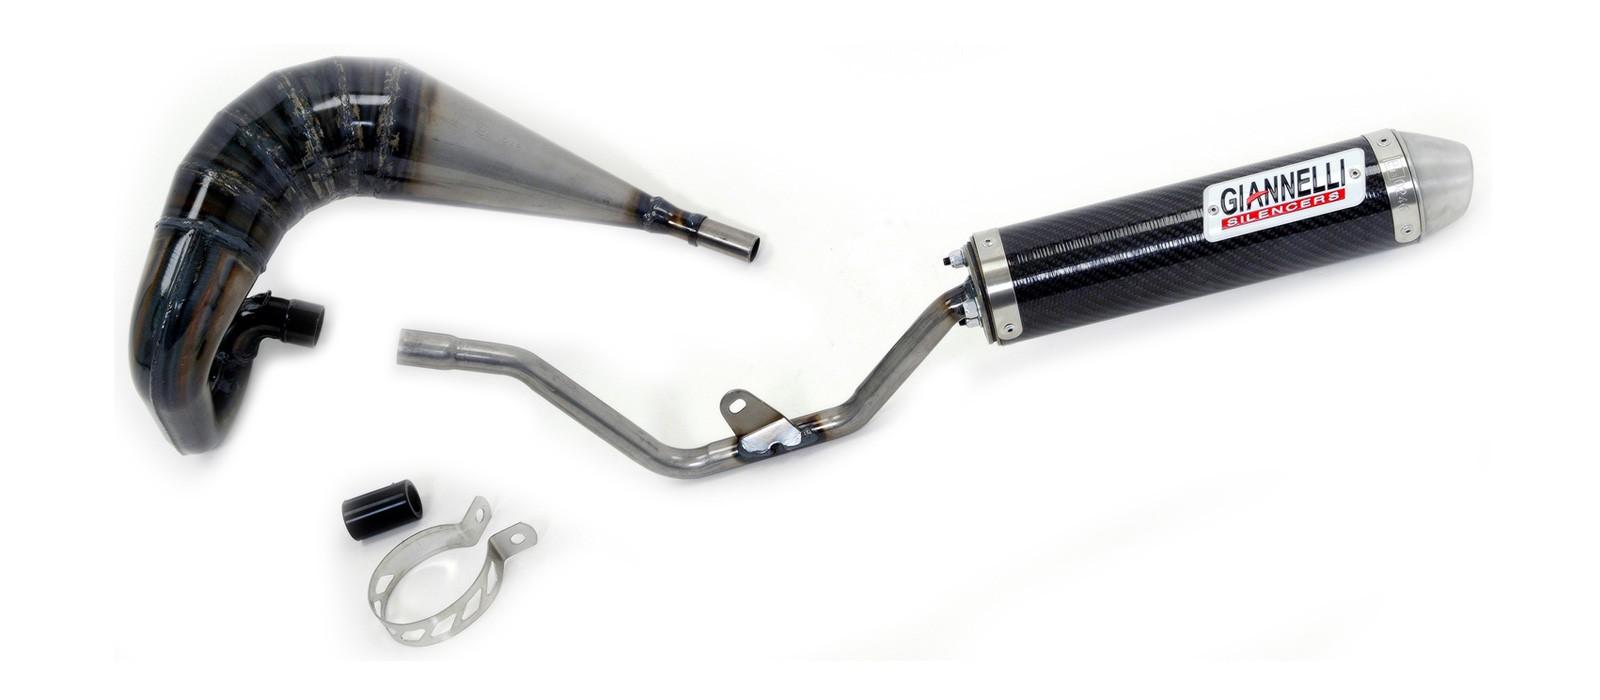 ESCAPES GIANNELLI PEUGEOT - Silenciador carbono enduro/cross 2T Peugeot XP6 SM 50 Giannelli 34681HF -